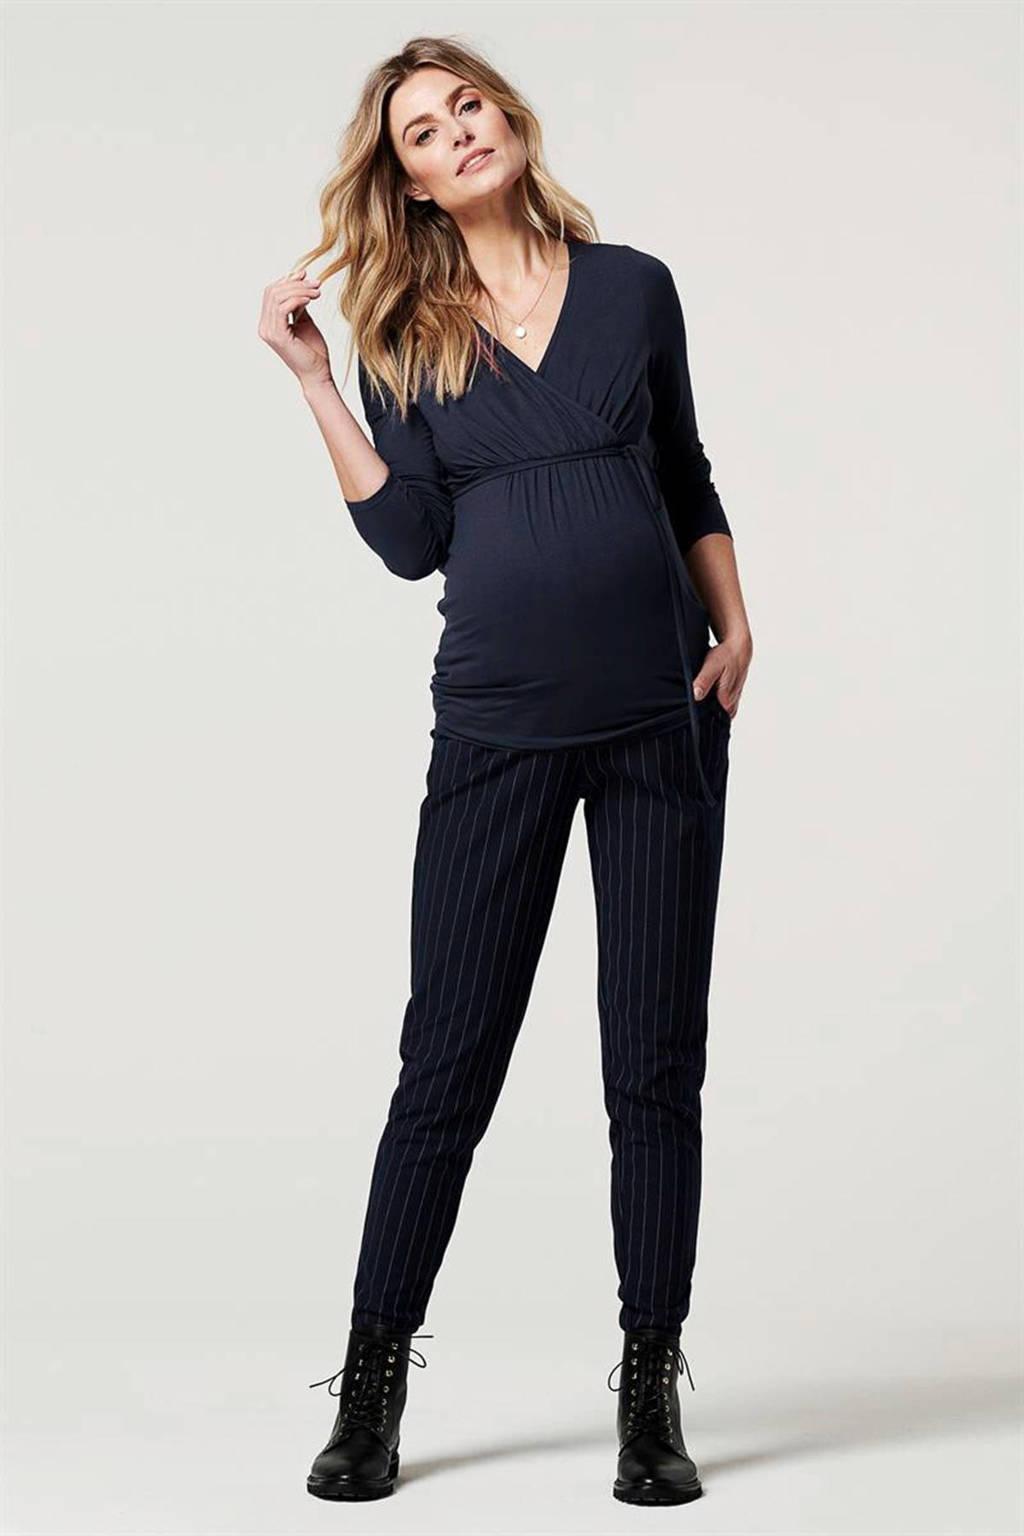 Noppies gestreepte low waist slim fit zwangerschapsbroek Renee donkerblauw/wit, Donkerblauw/wit